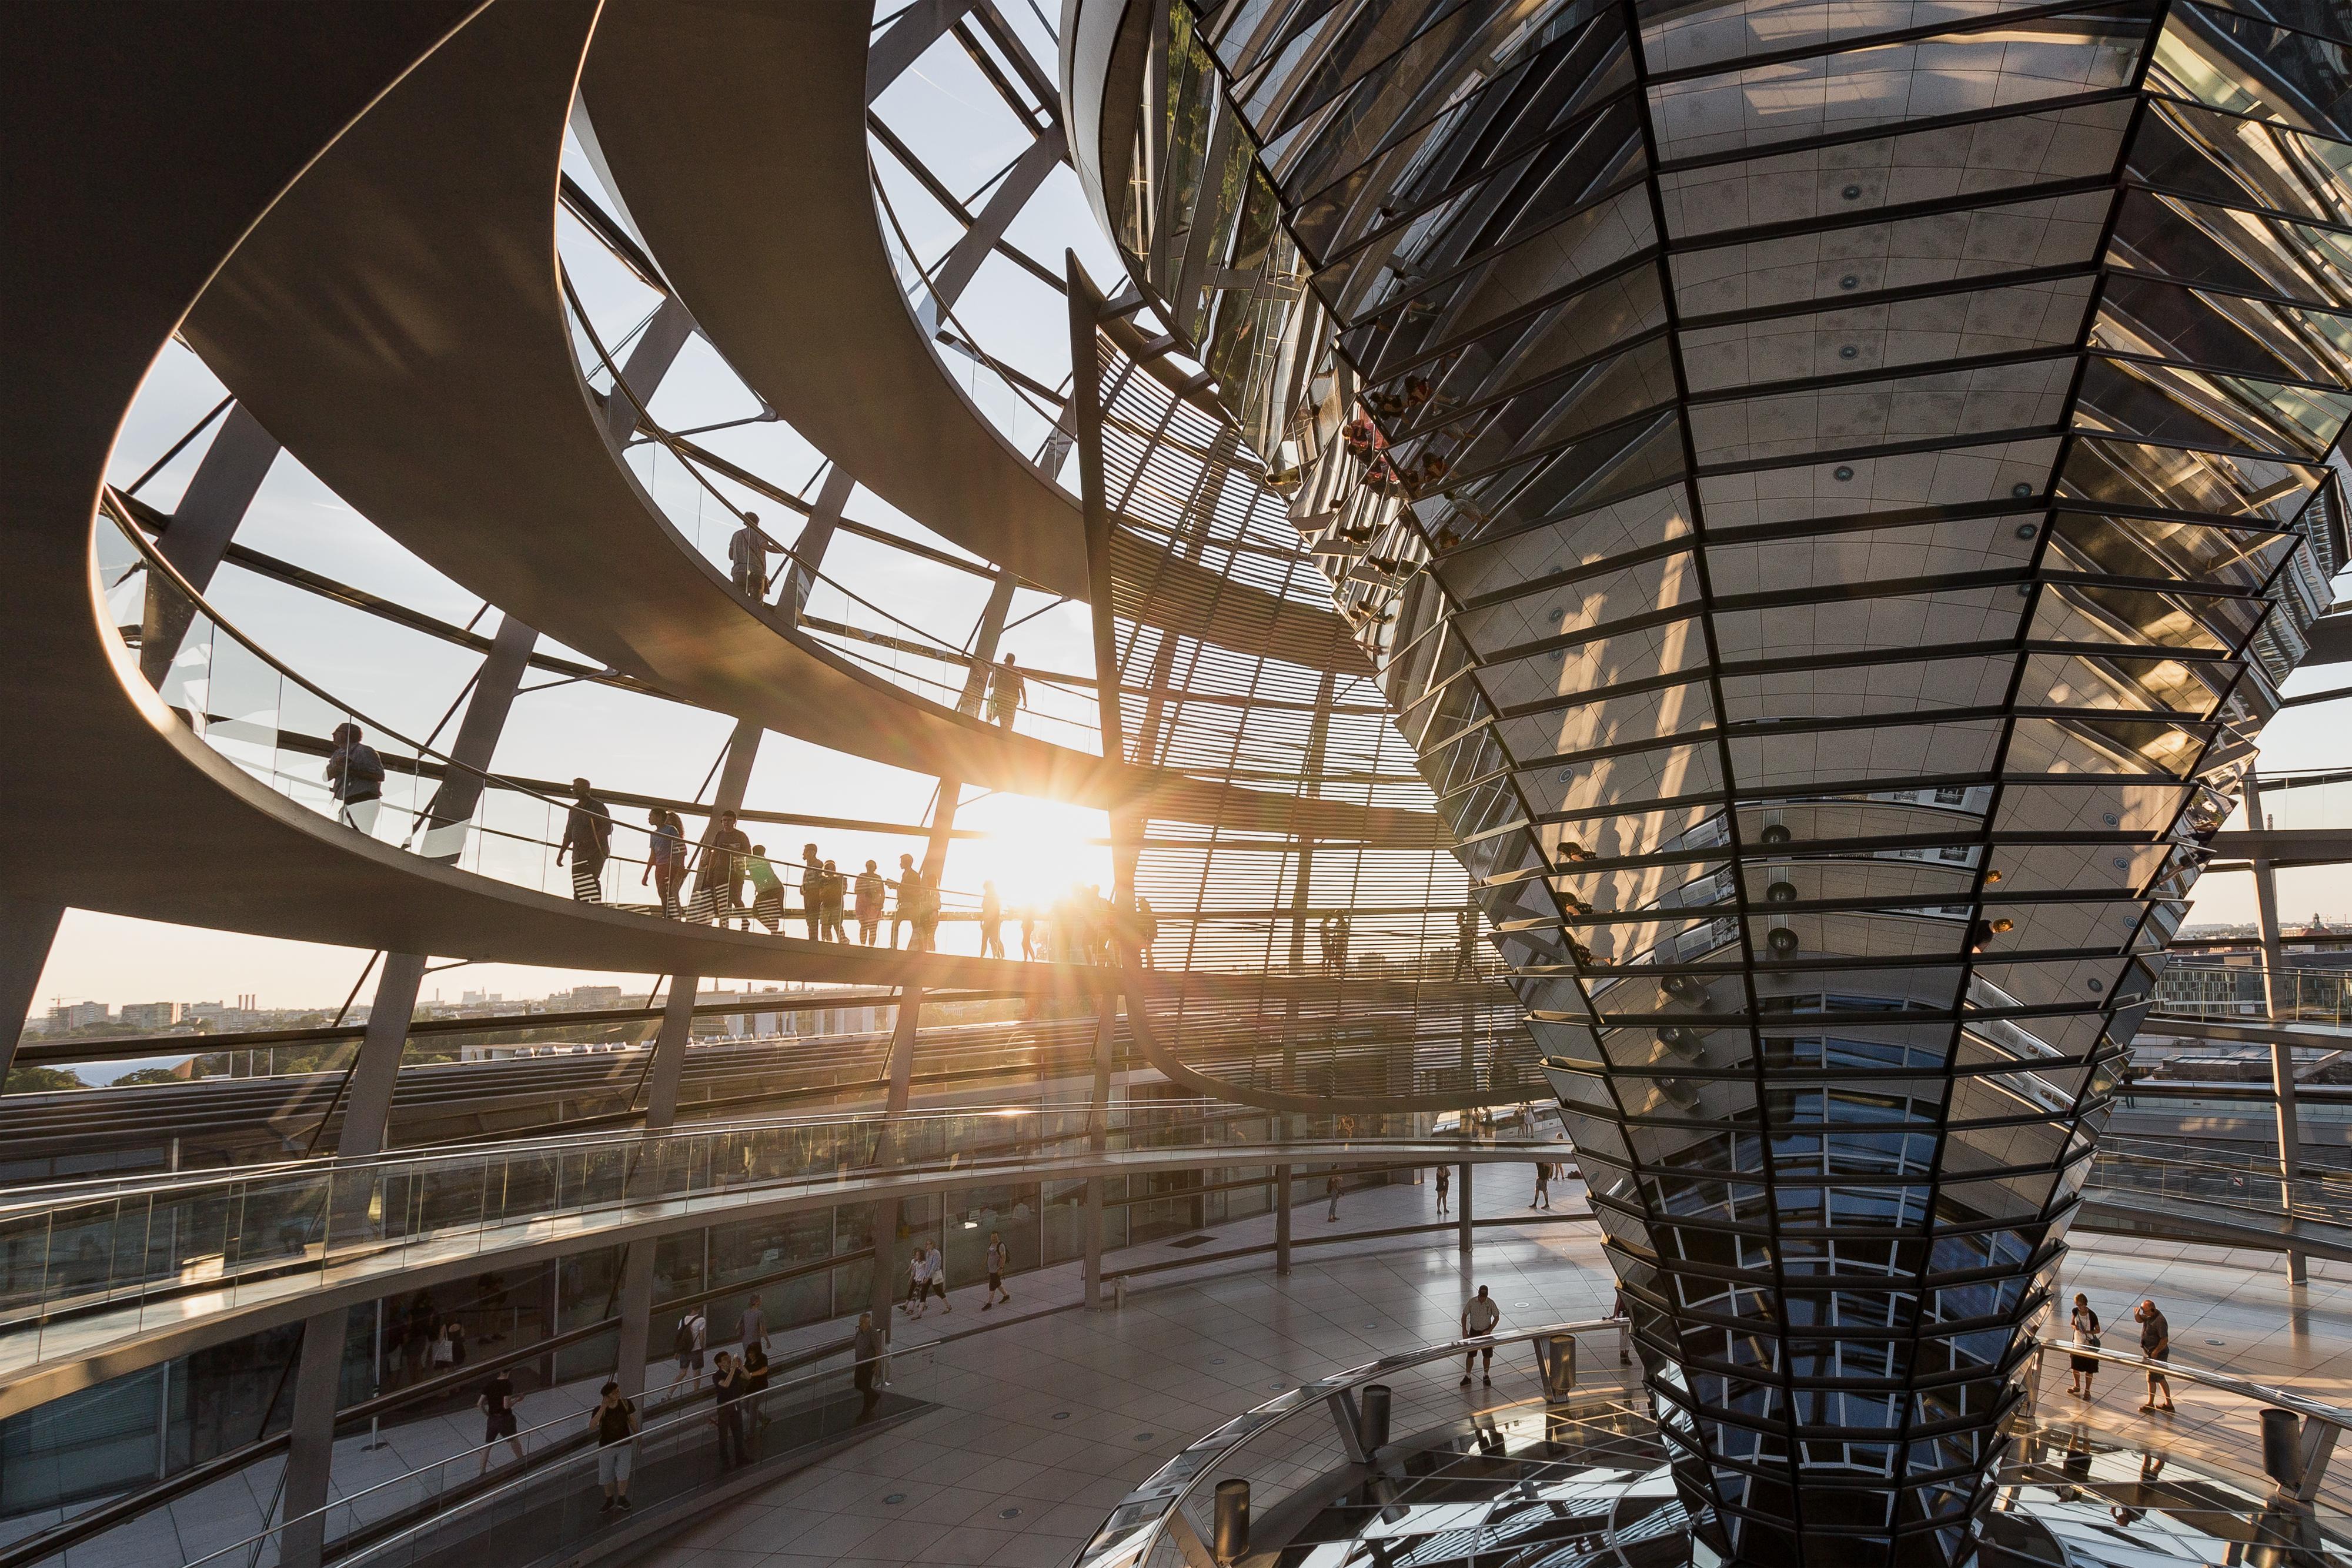 Seriøst Datei:Berlin Reichstag Kuppel Innenansicht.jpg – Wikipedia XP-14